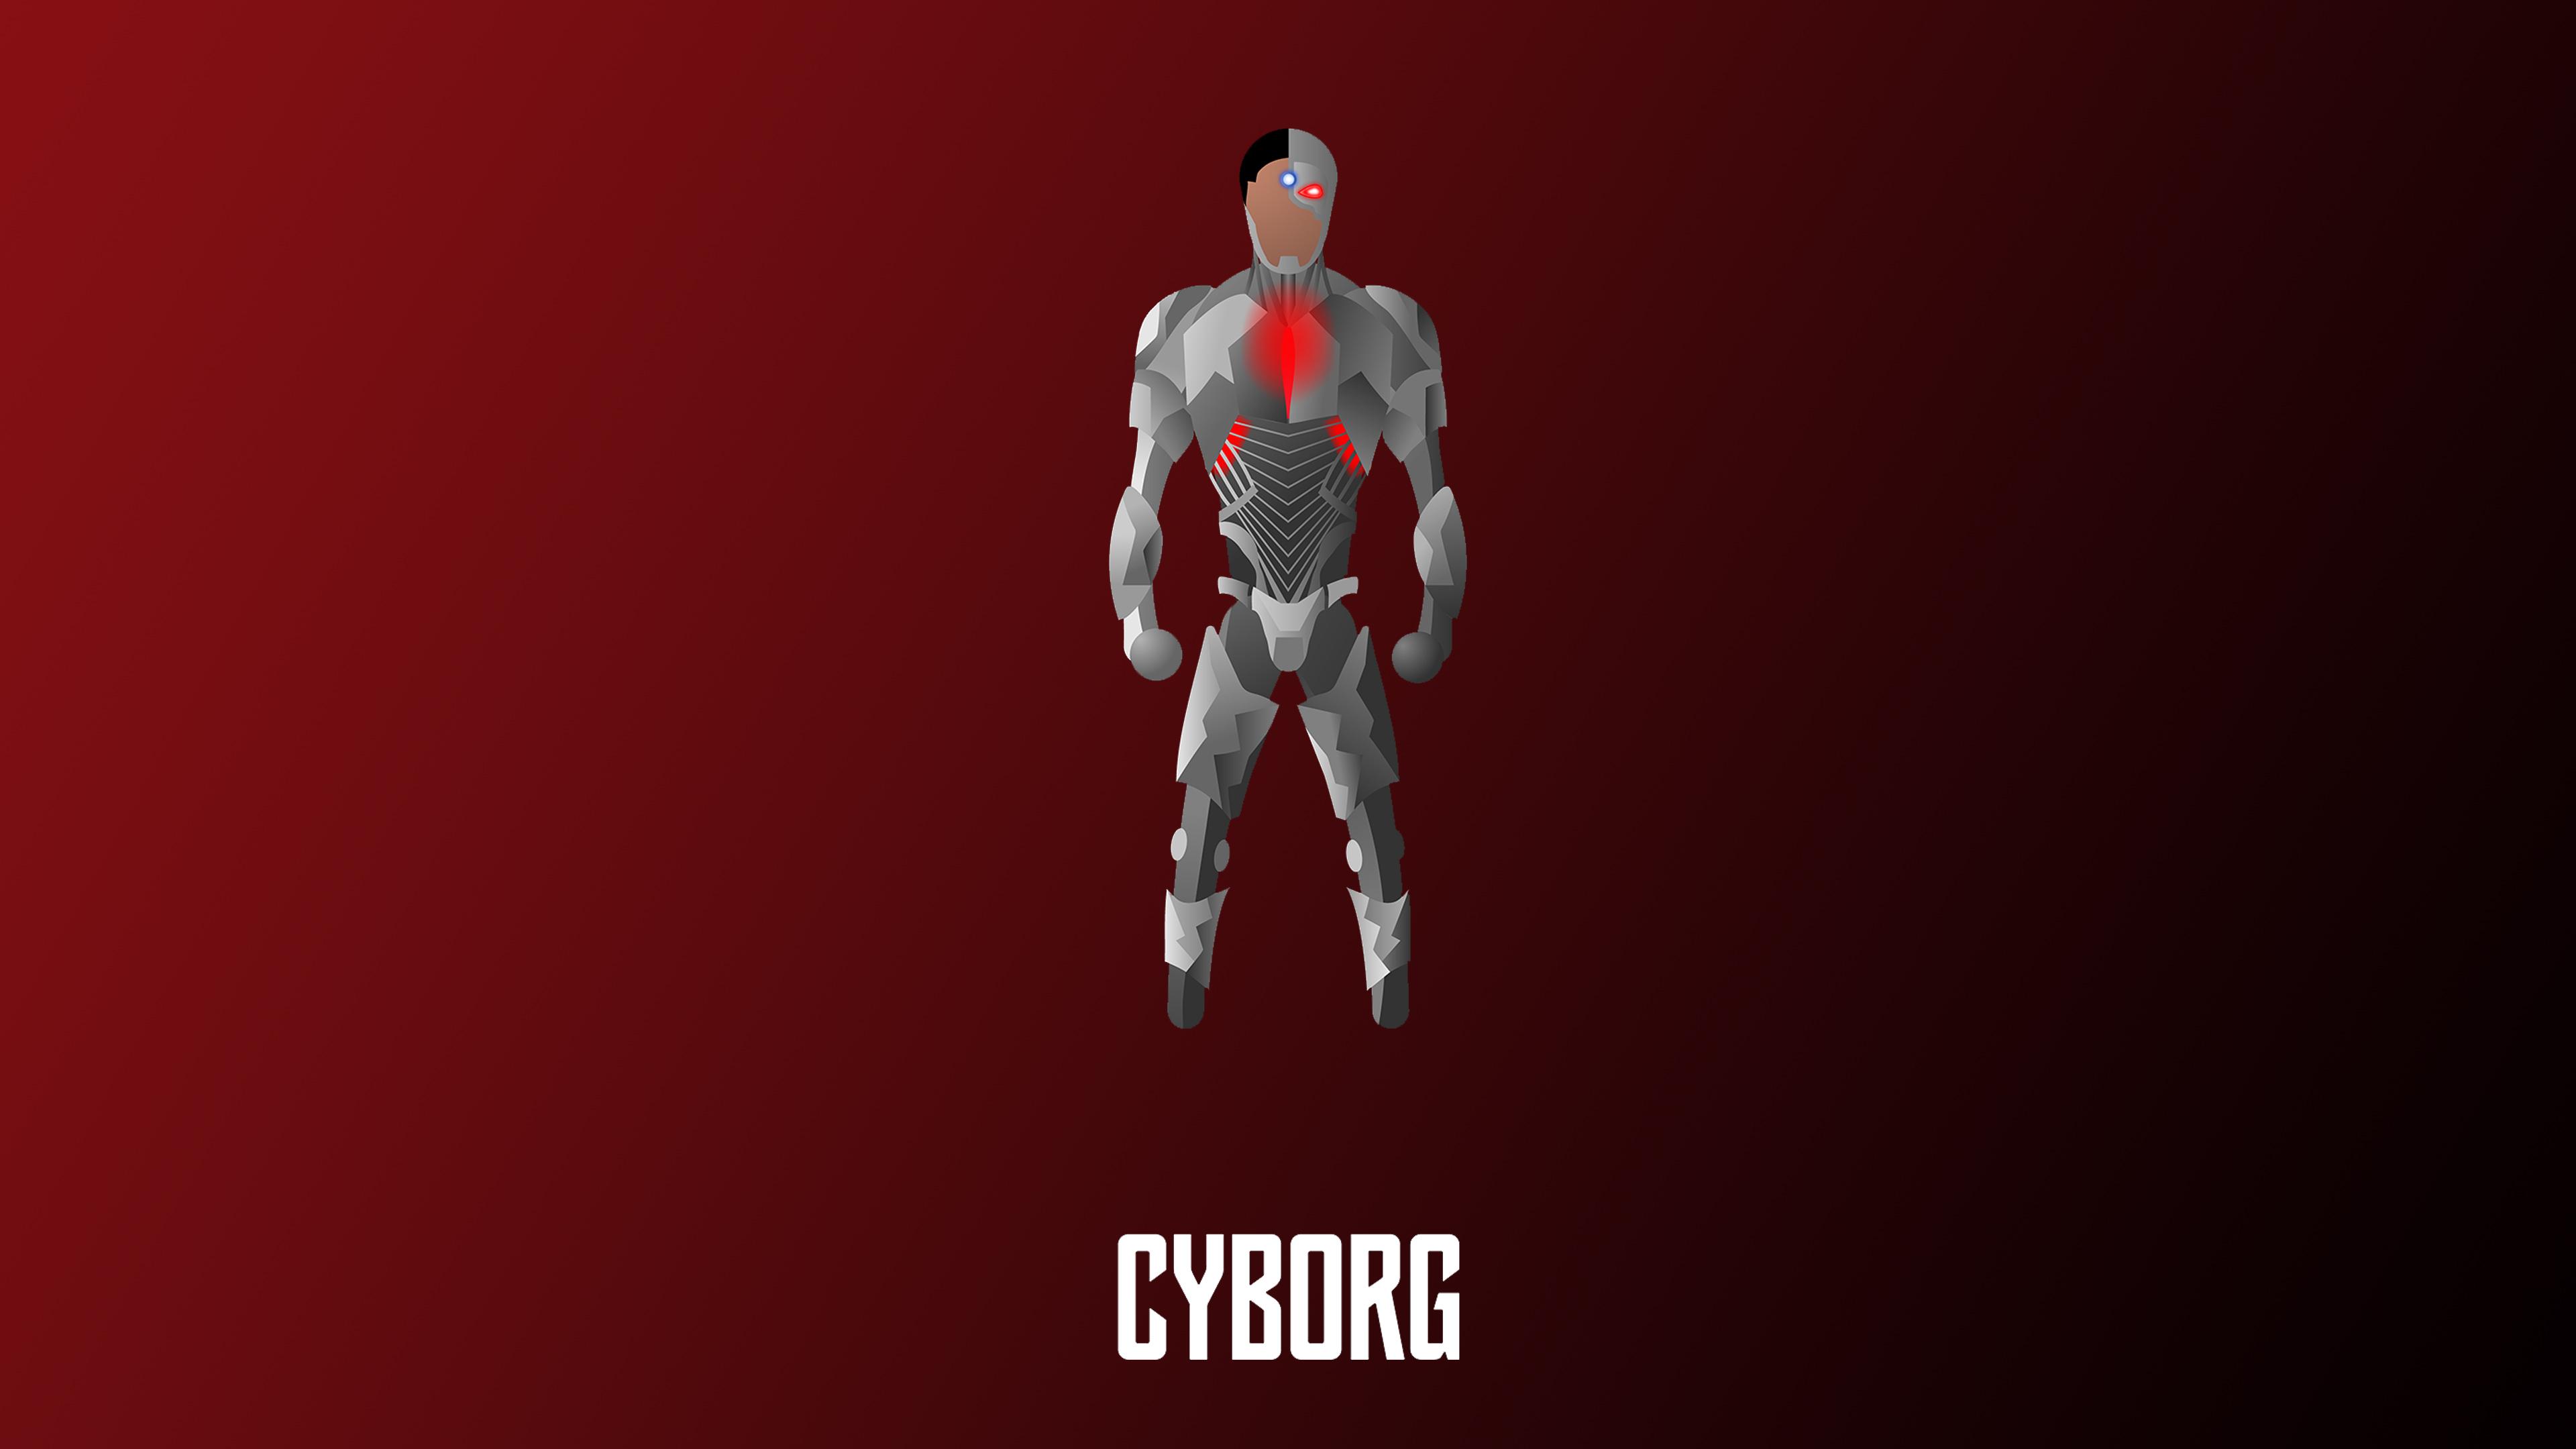 cyborg illustration 4k 1536523723 - Cyborg Illustration 4k - superheroes wallpapers, minimalist wallpapers, minimalism wallpapers, illustration wallpapers, hd-wallpapers, digital art wallpapers, cyborg wallpapers, behance wallpapers, 4k-wallpapers